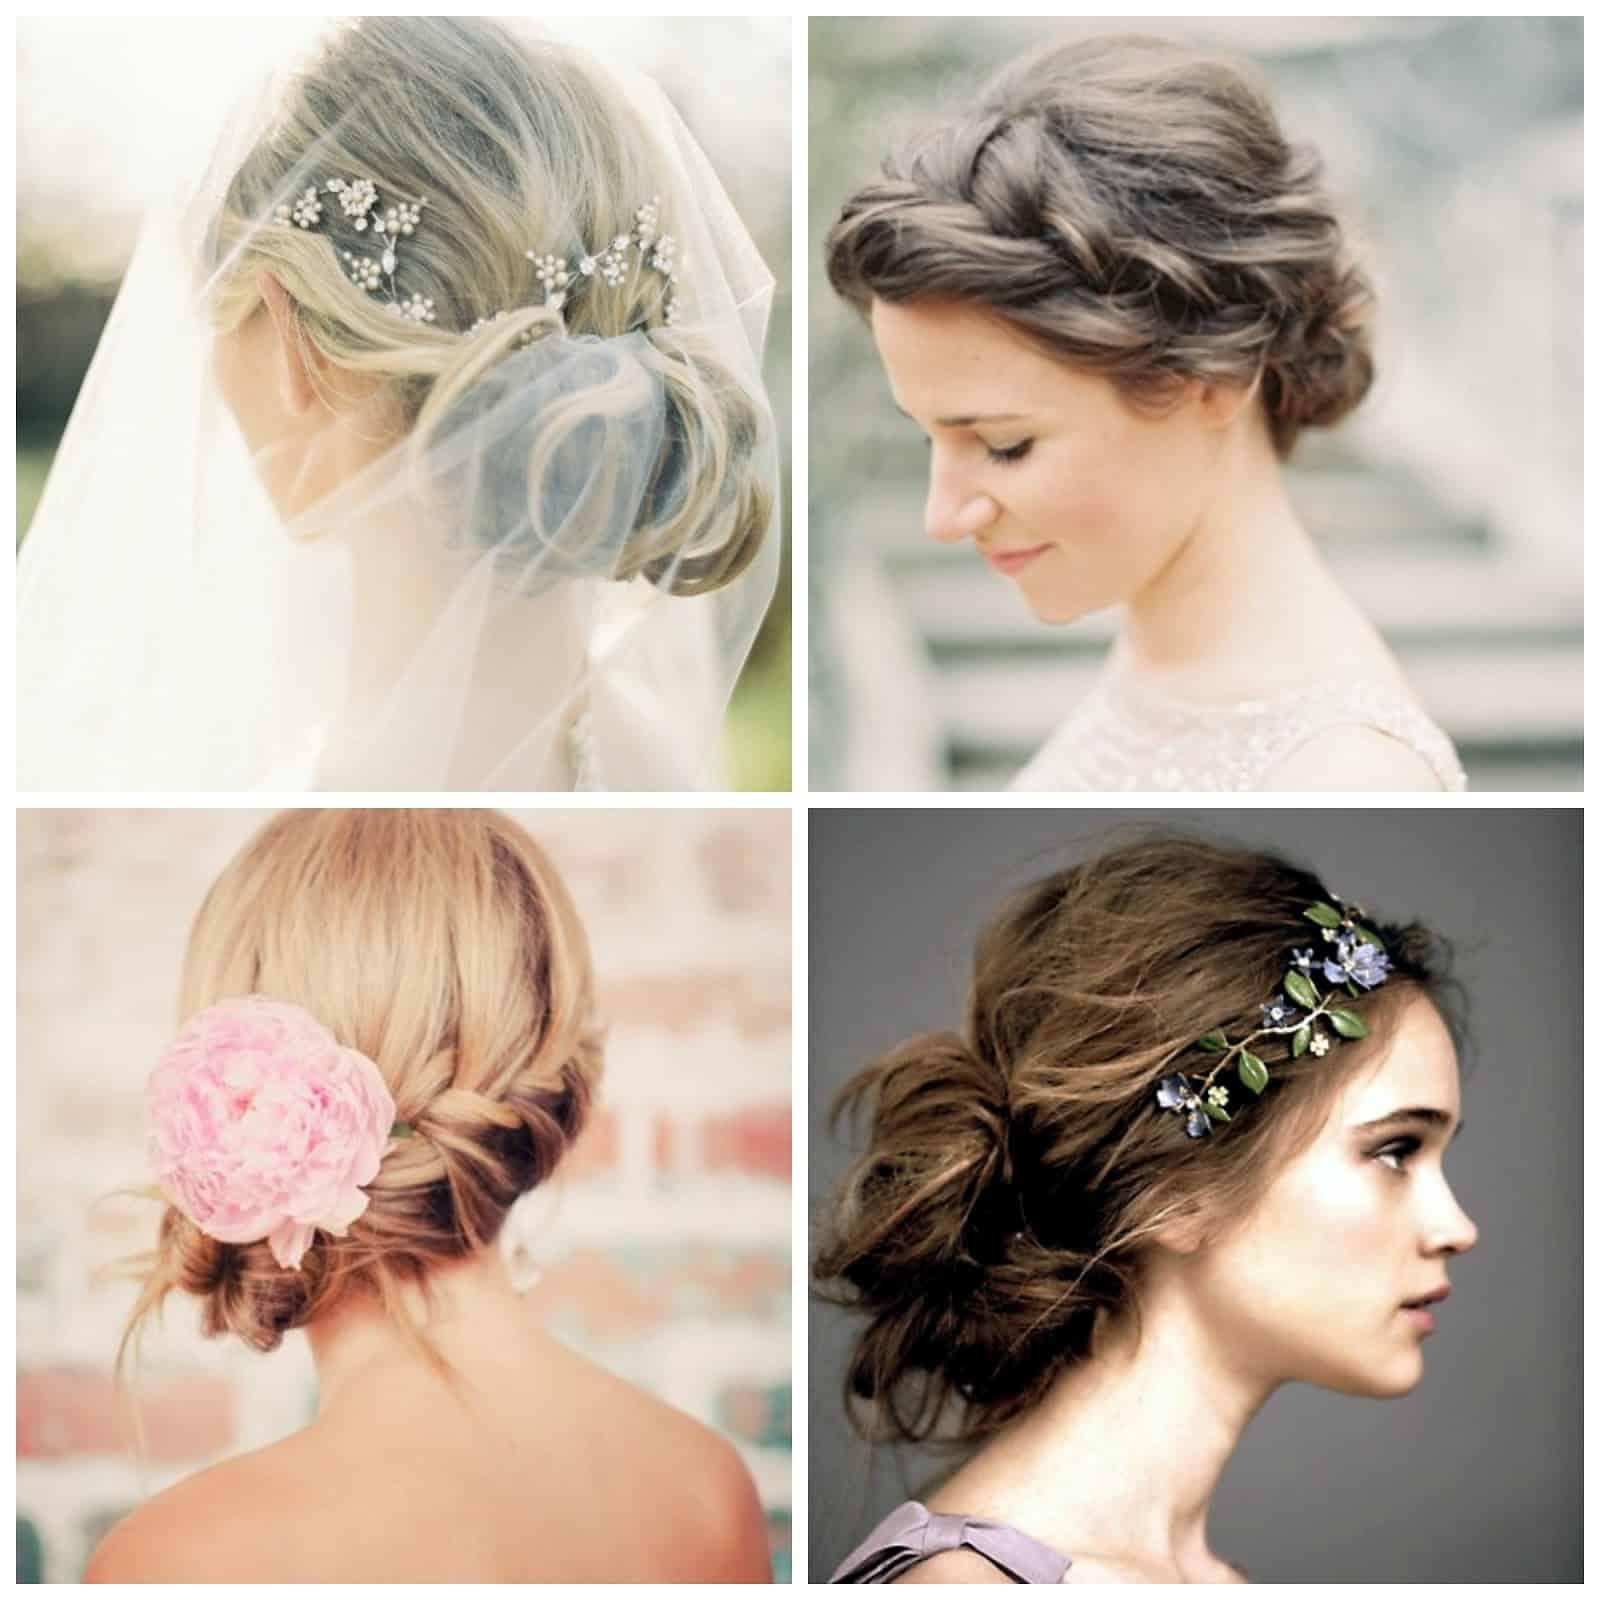 Peinados para boda 2019 f ciles paso a paso para novia e - Peinados elegantes para una boda ...